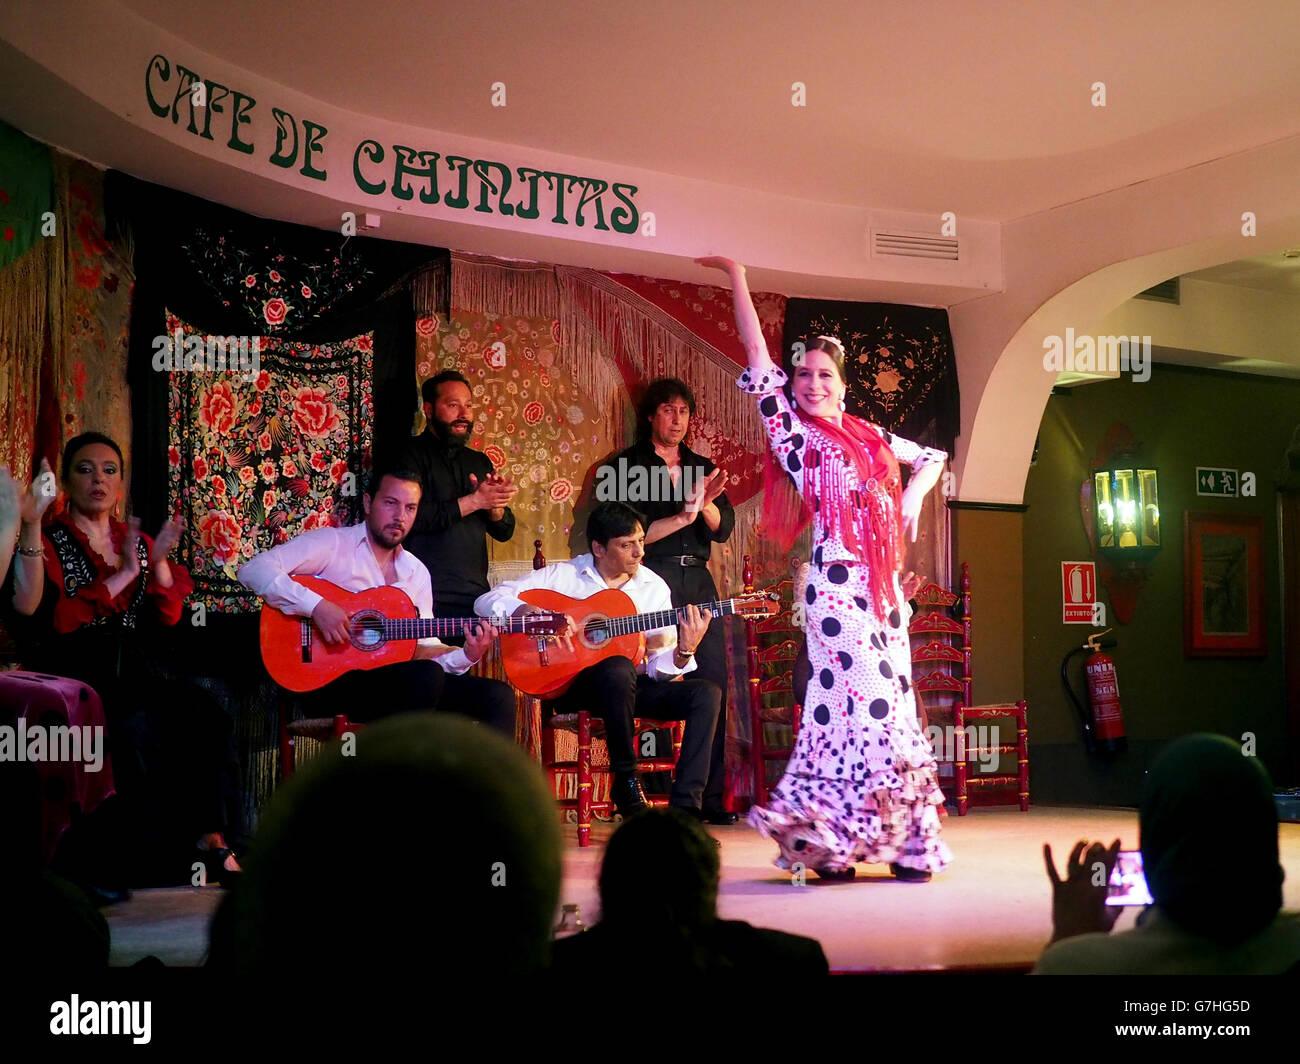 Flamenco club, Madrid, Spain - Stock Image